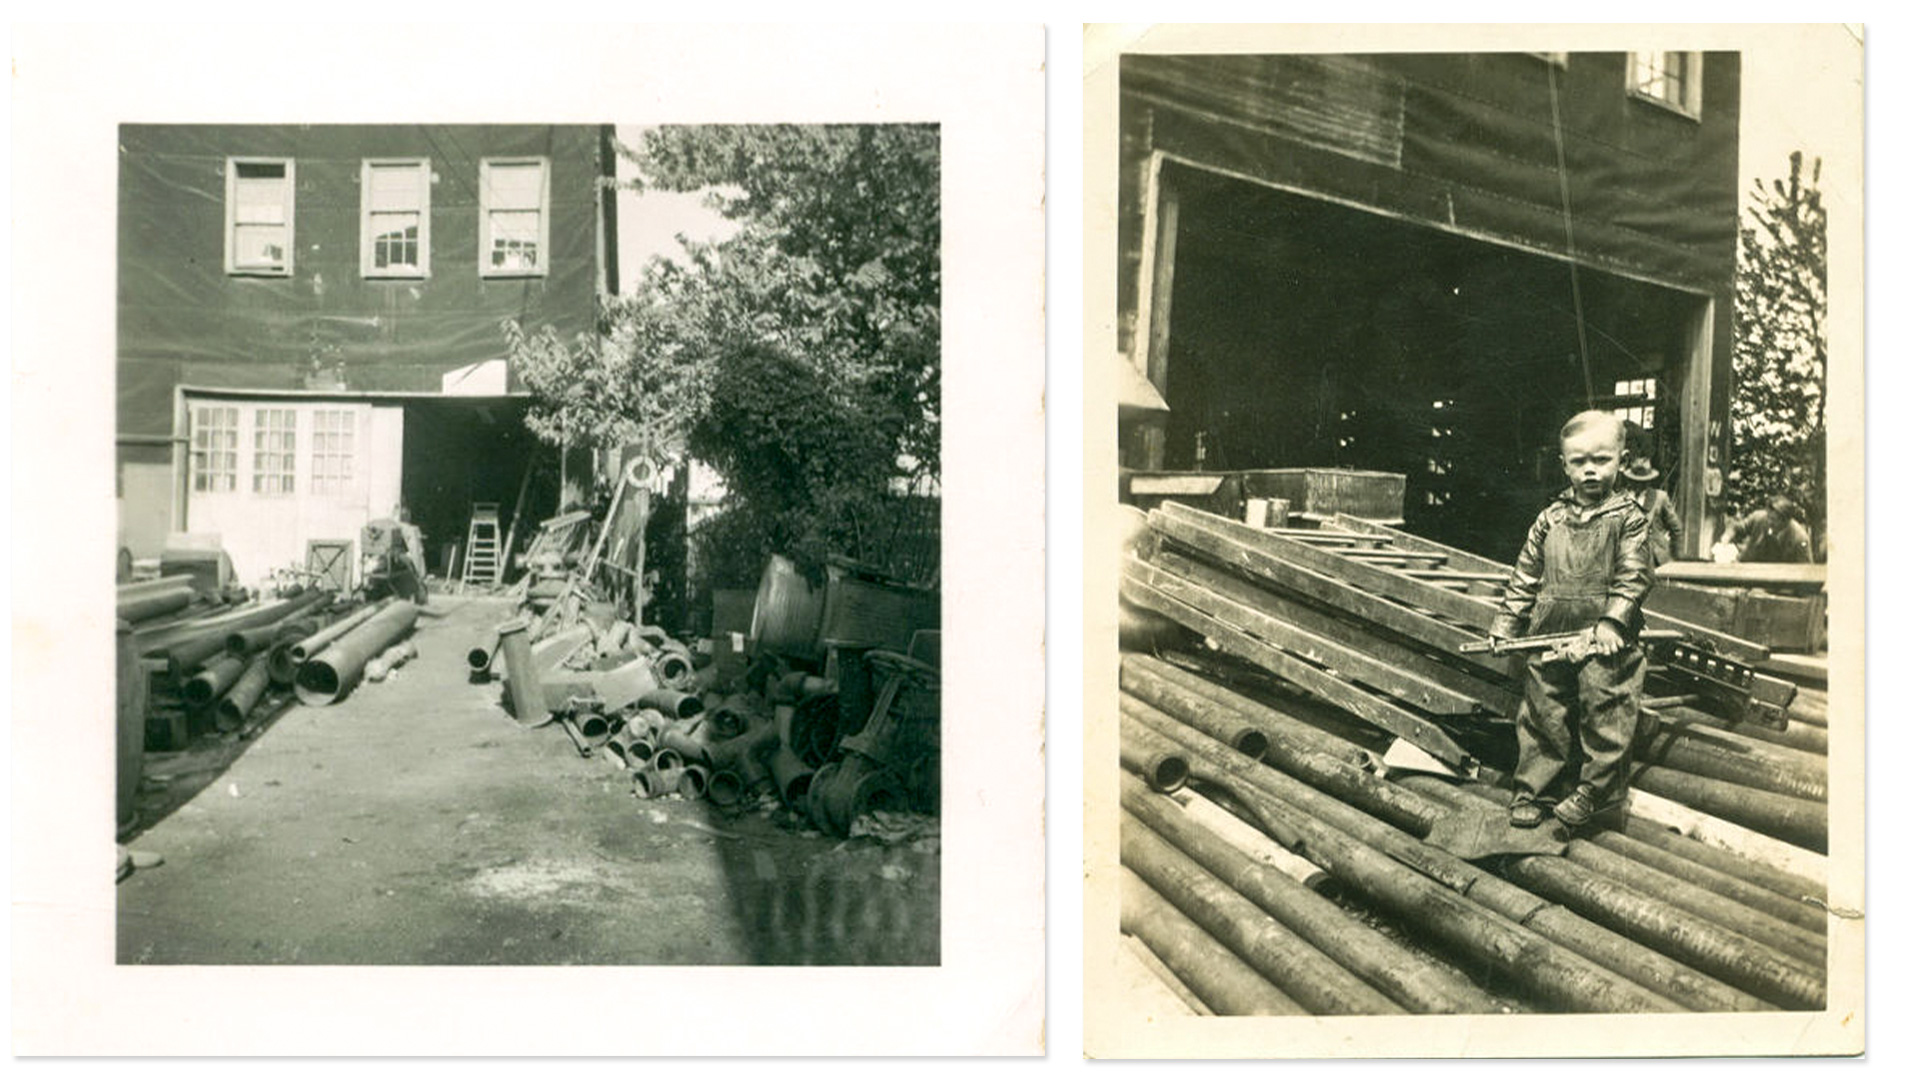 1920's Spaeder Shop in the backyard of Tim Spaeder's Grandparents